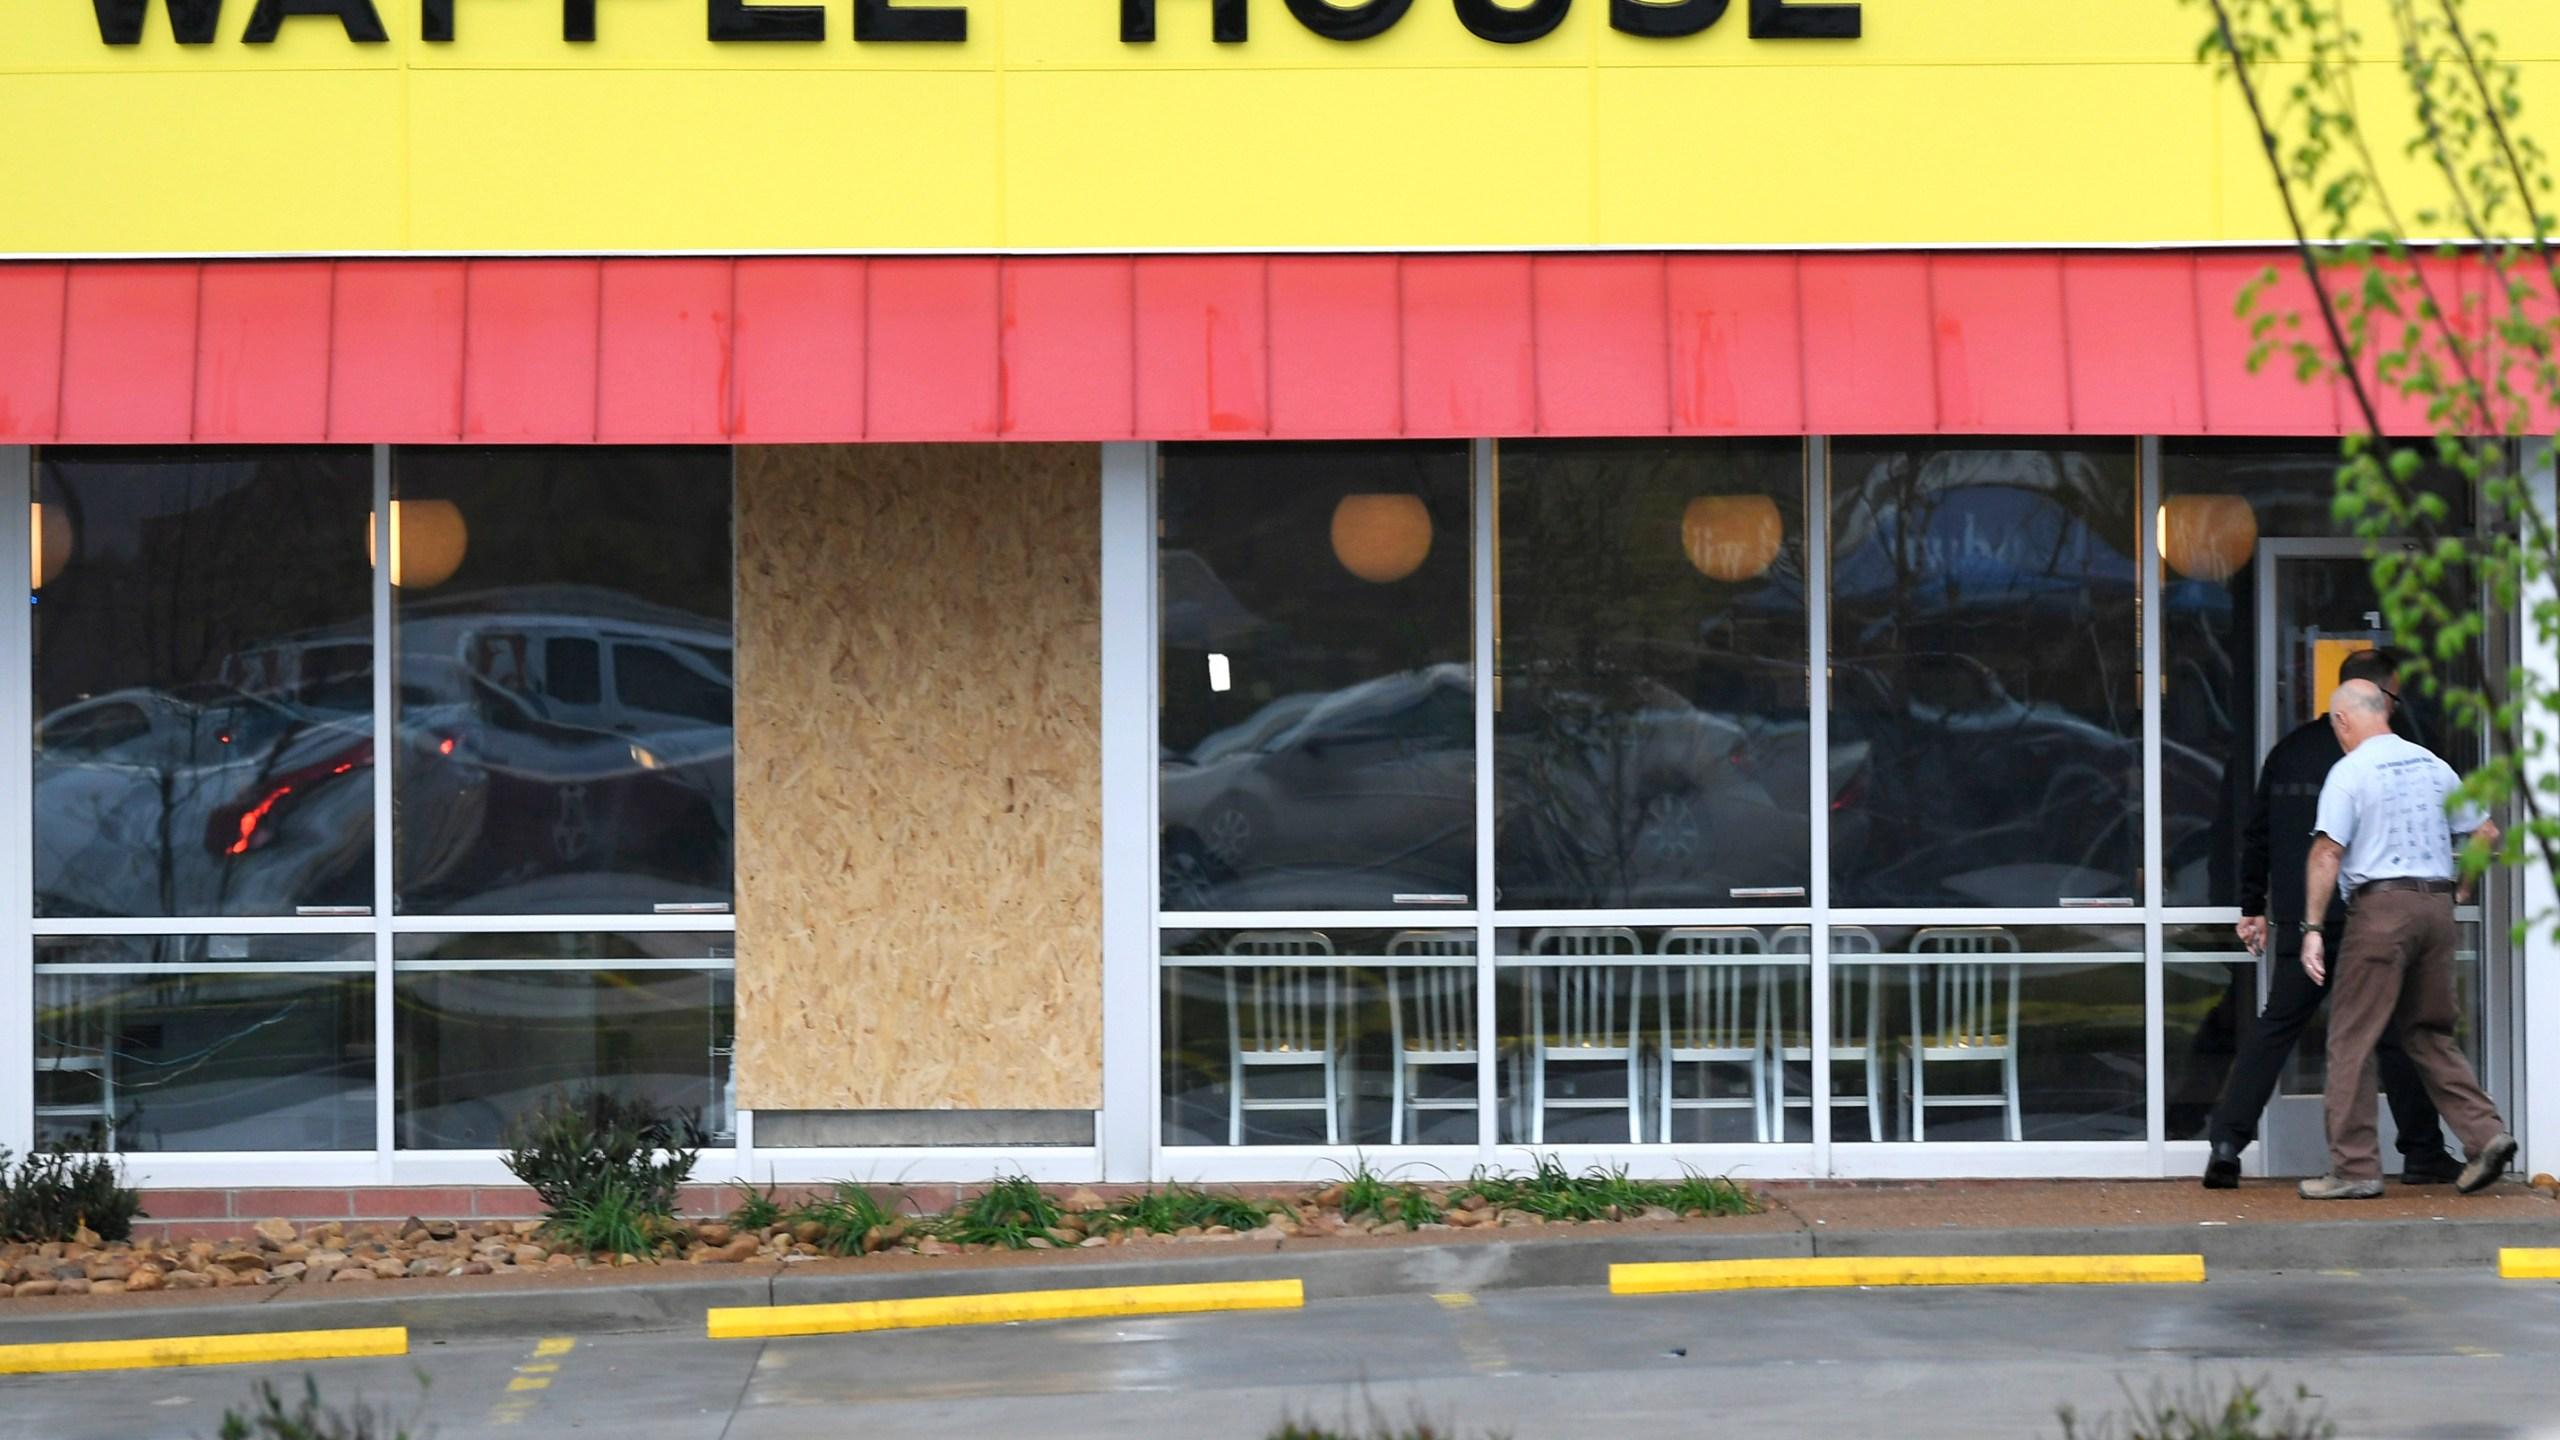 Waffle_House_Shooting_18796-159532.jpg81180473